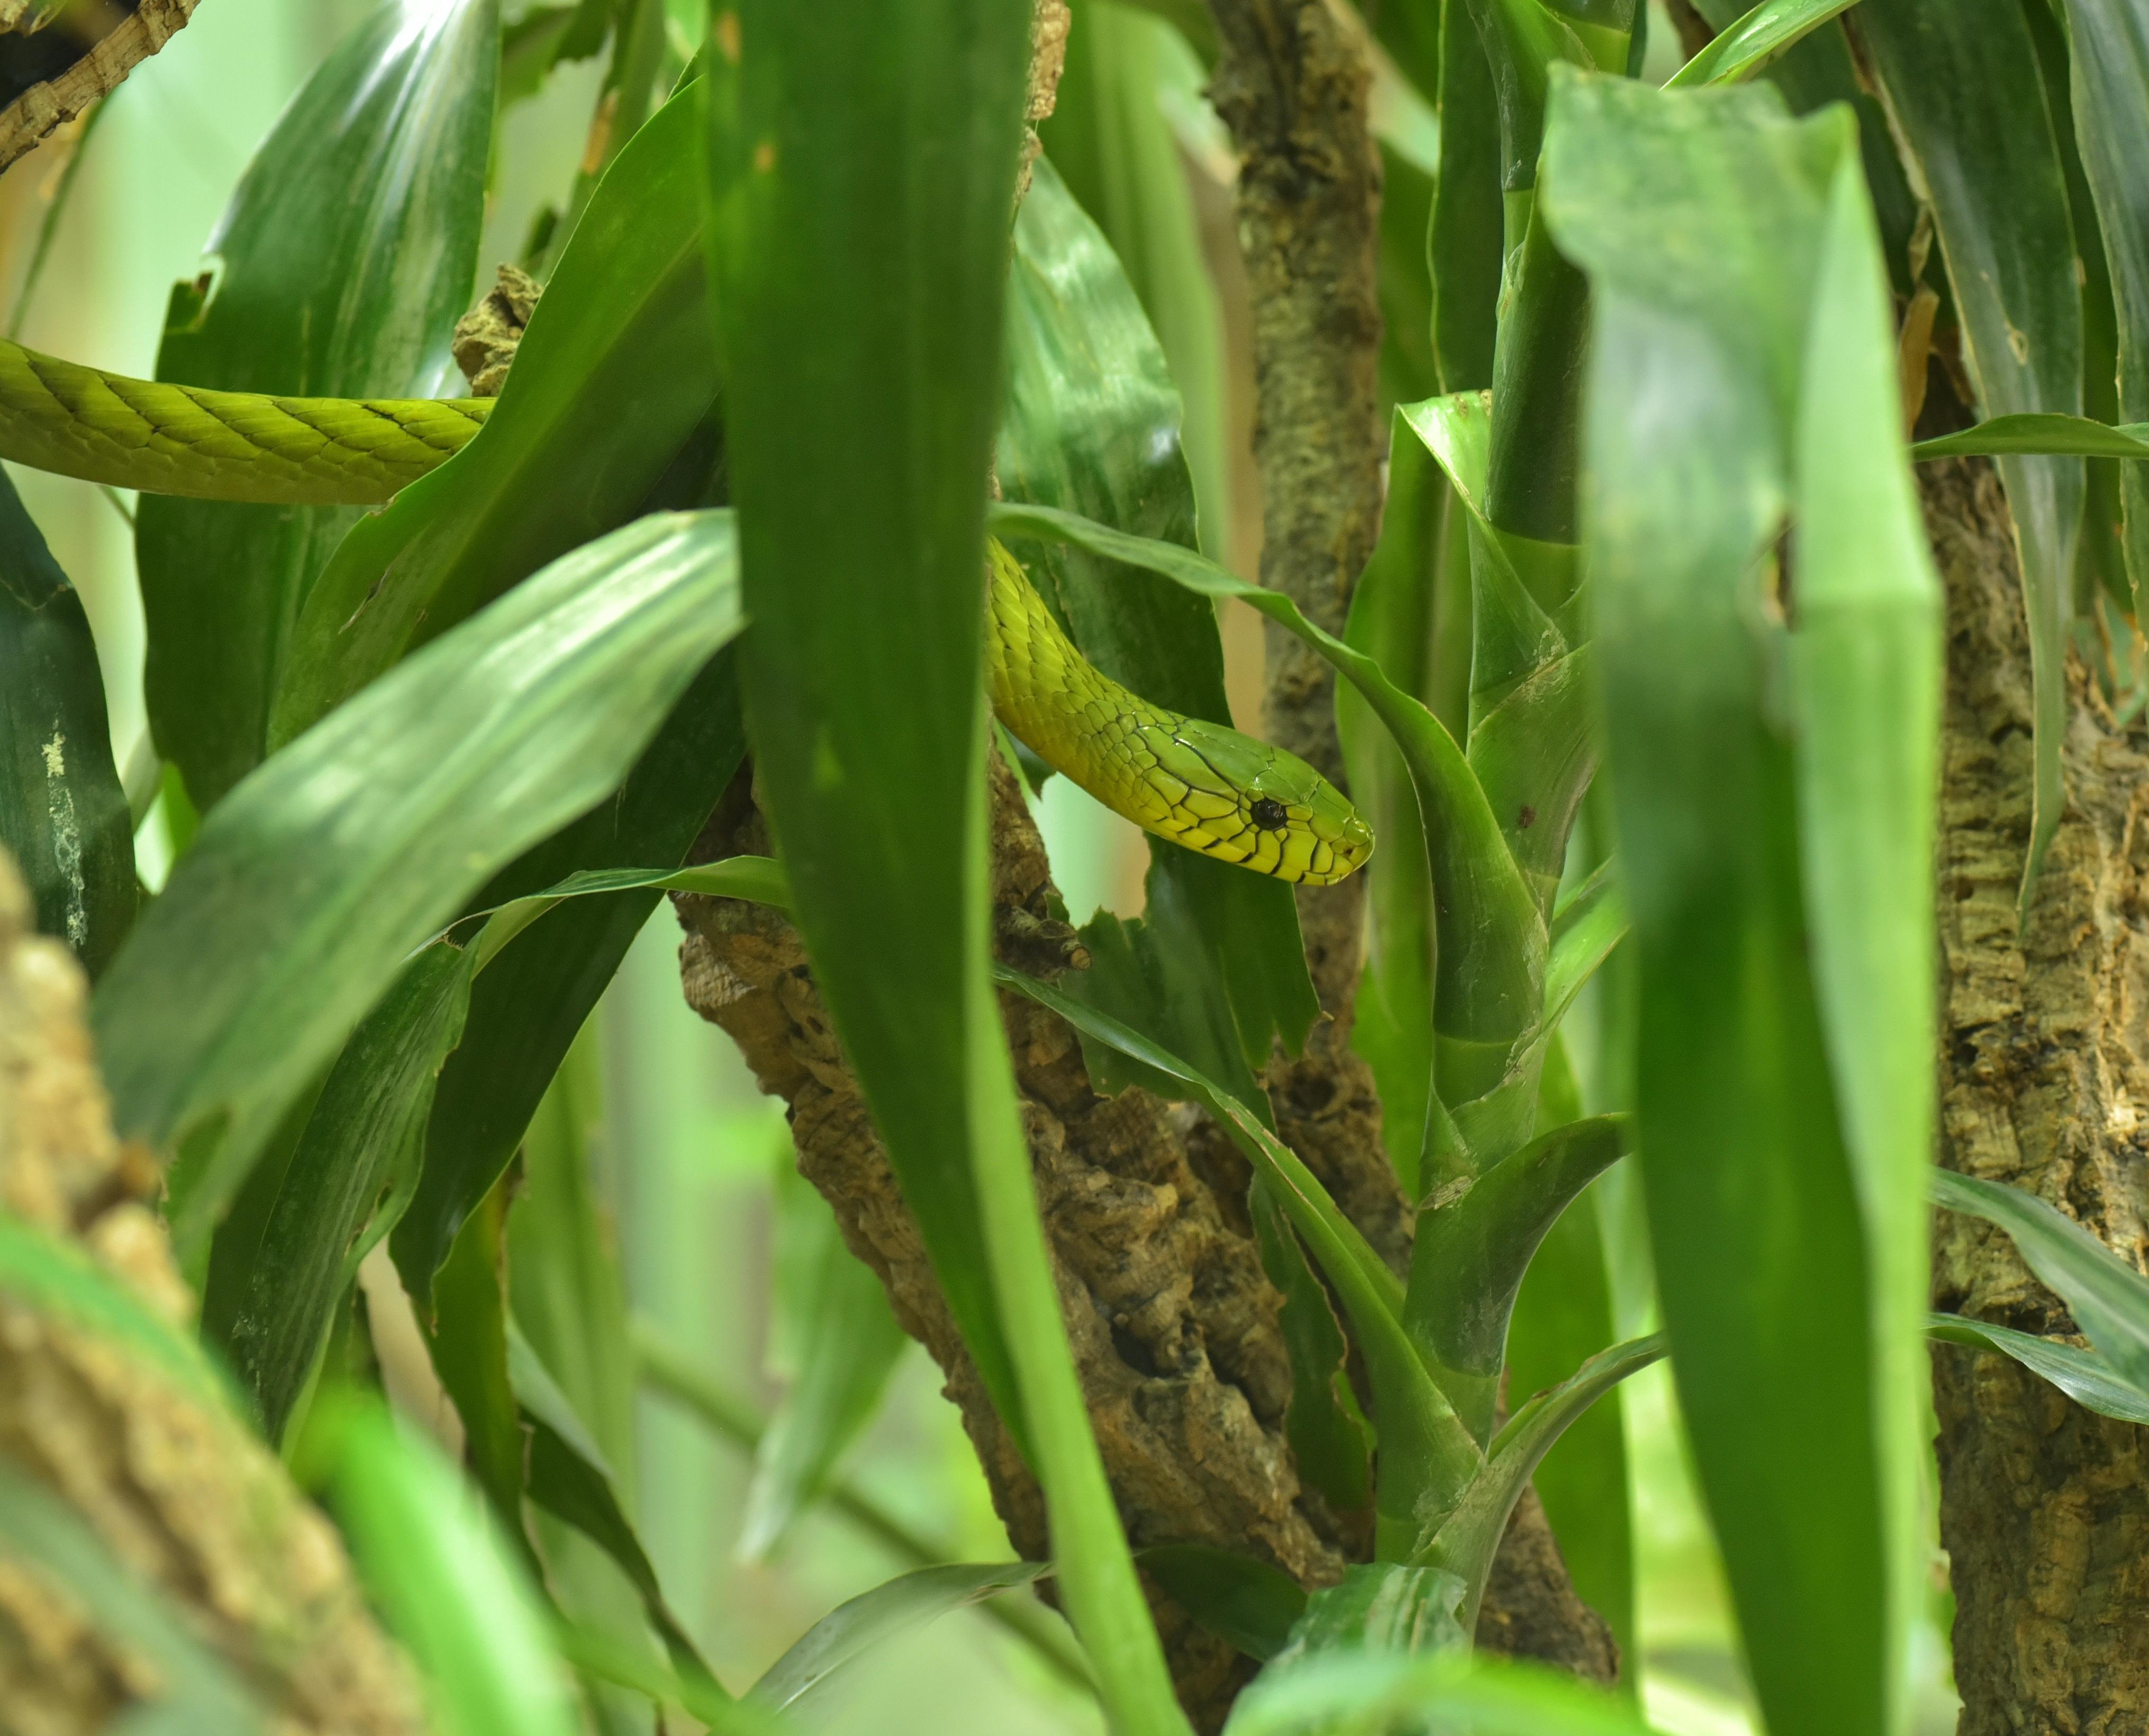 Free Images Flower Food Jungle Produce Crop Botany Predator